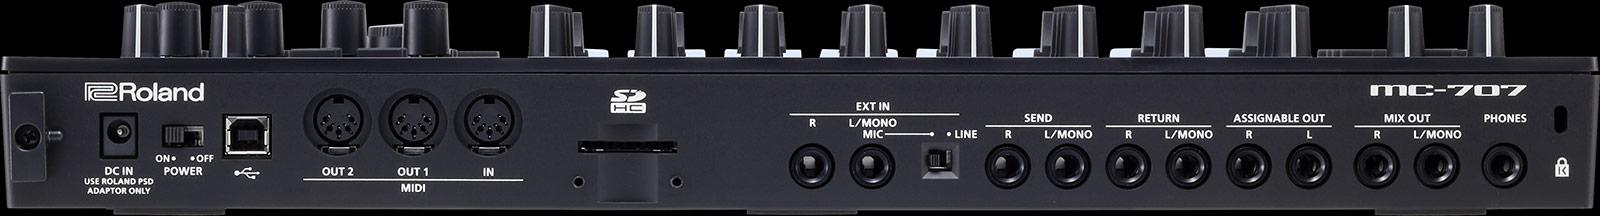 MC-707